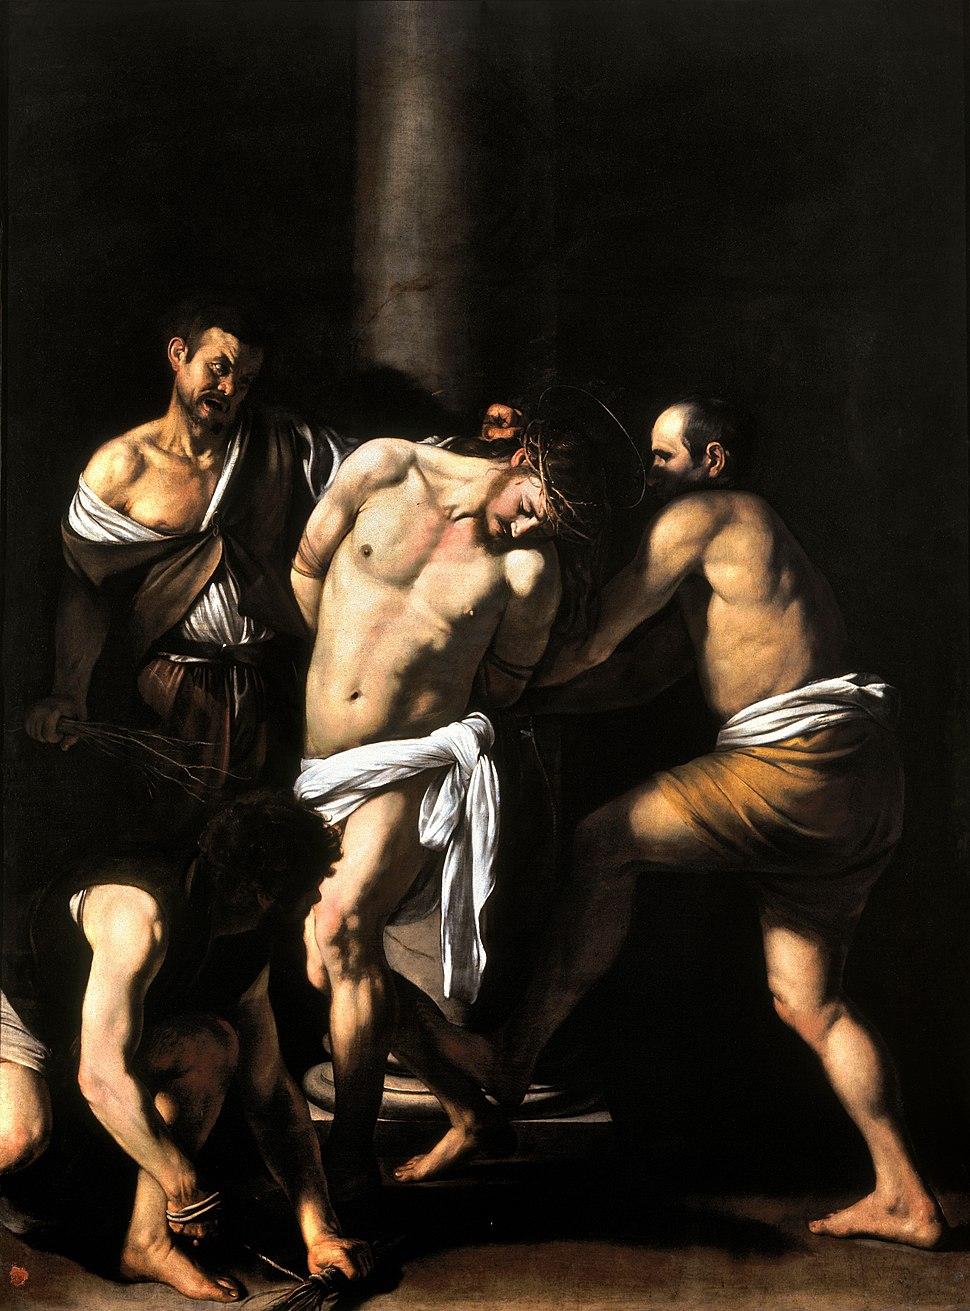 The Flagellation of Christ-Caravaggio (1607)